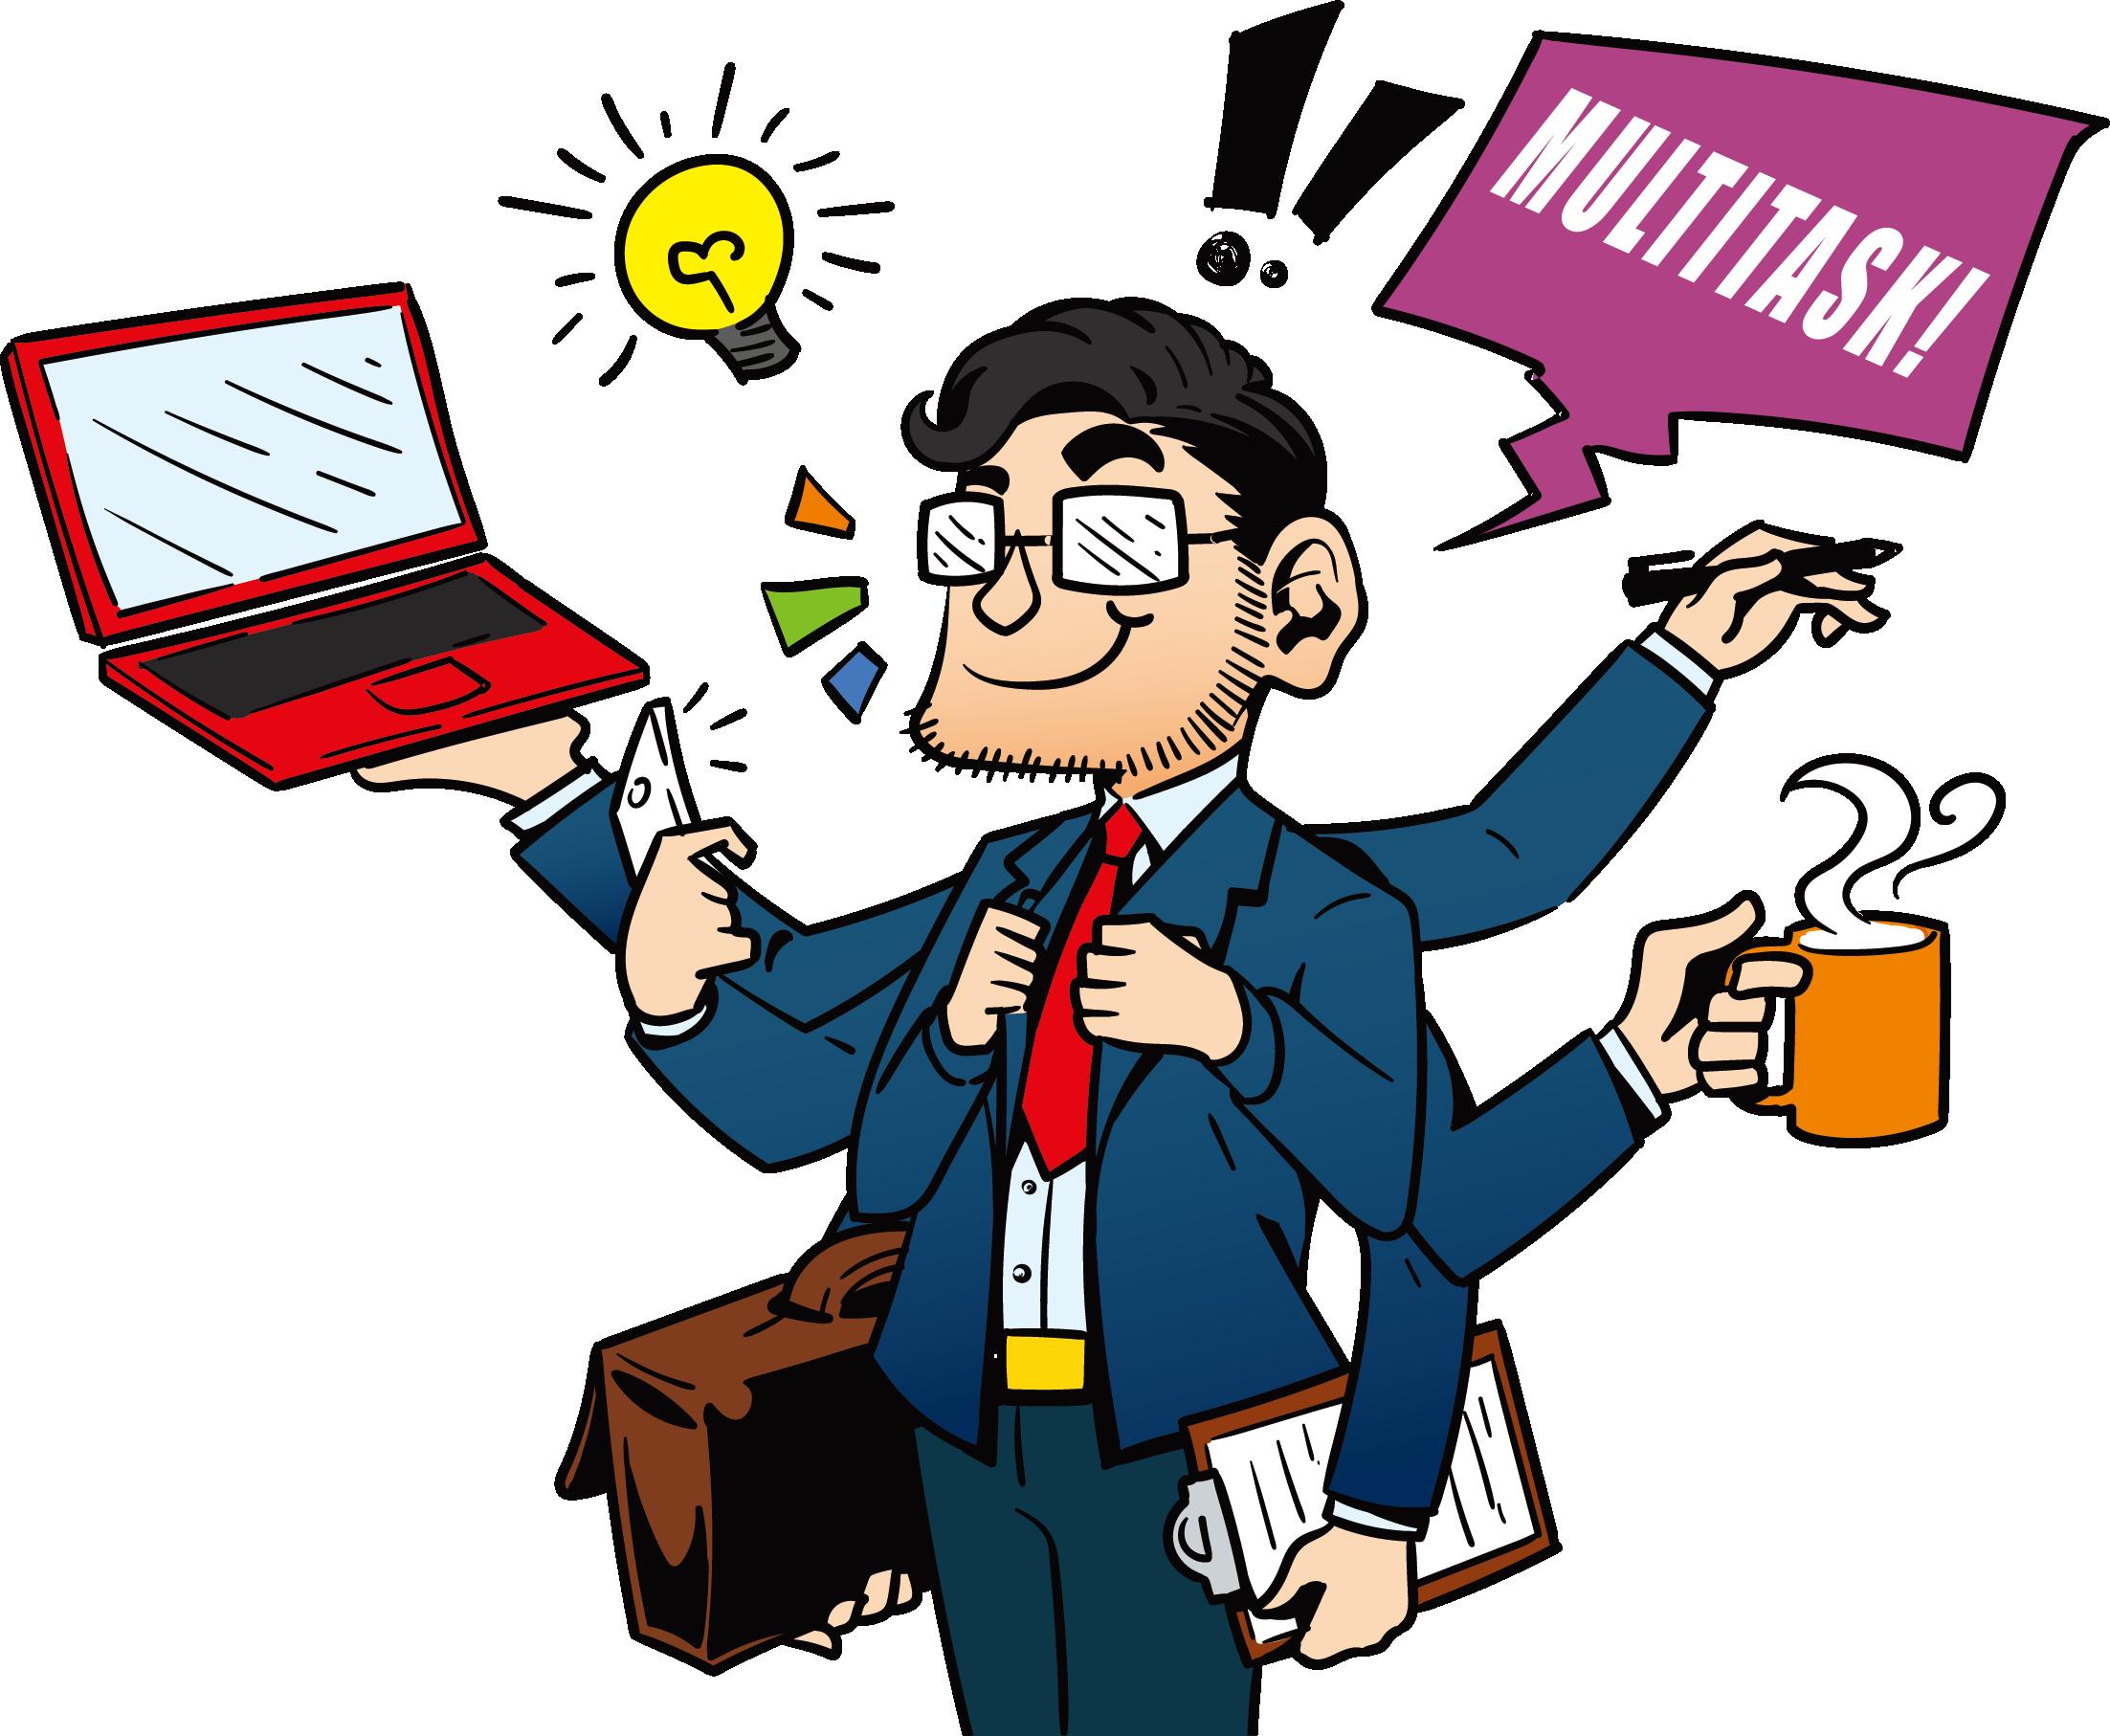 Working clipart laborer. Human multitasking illustration dealing